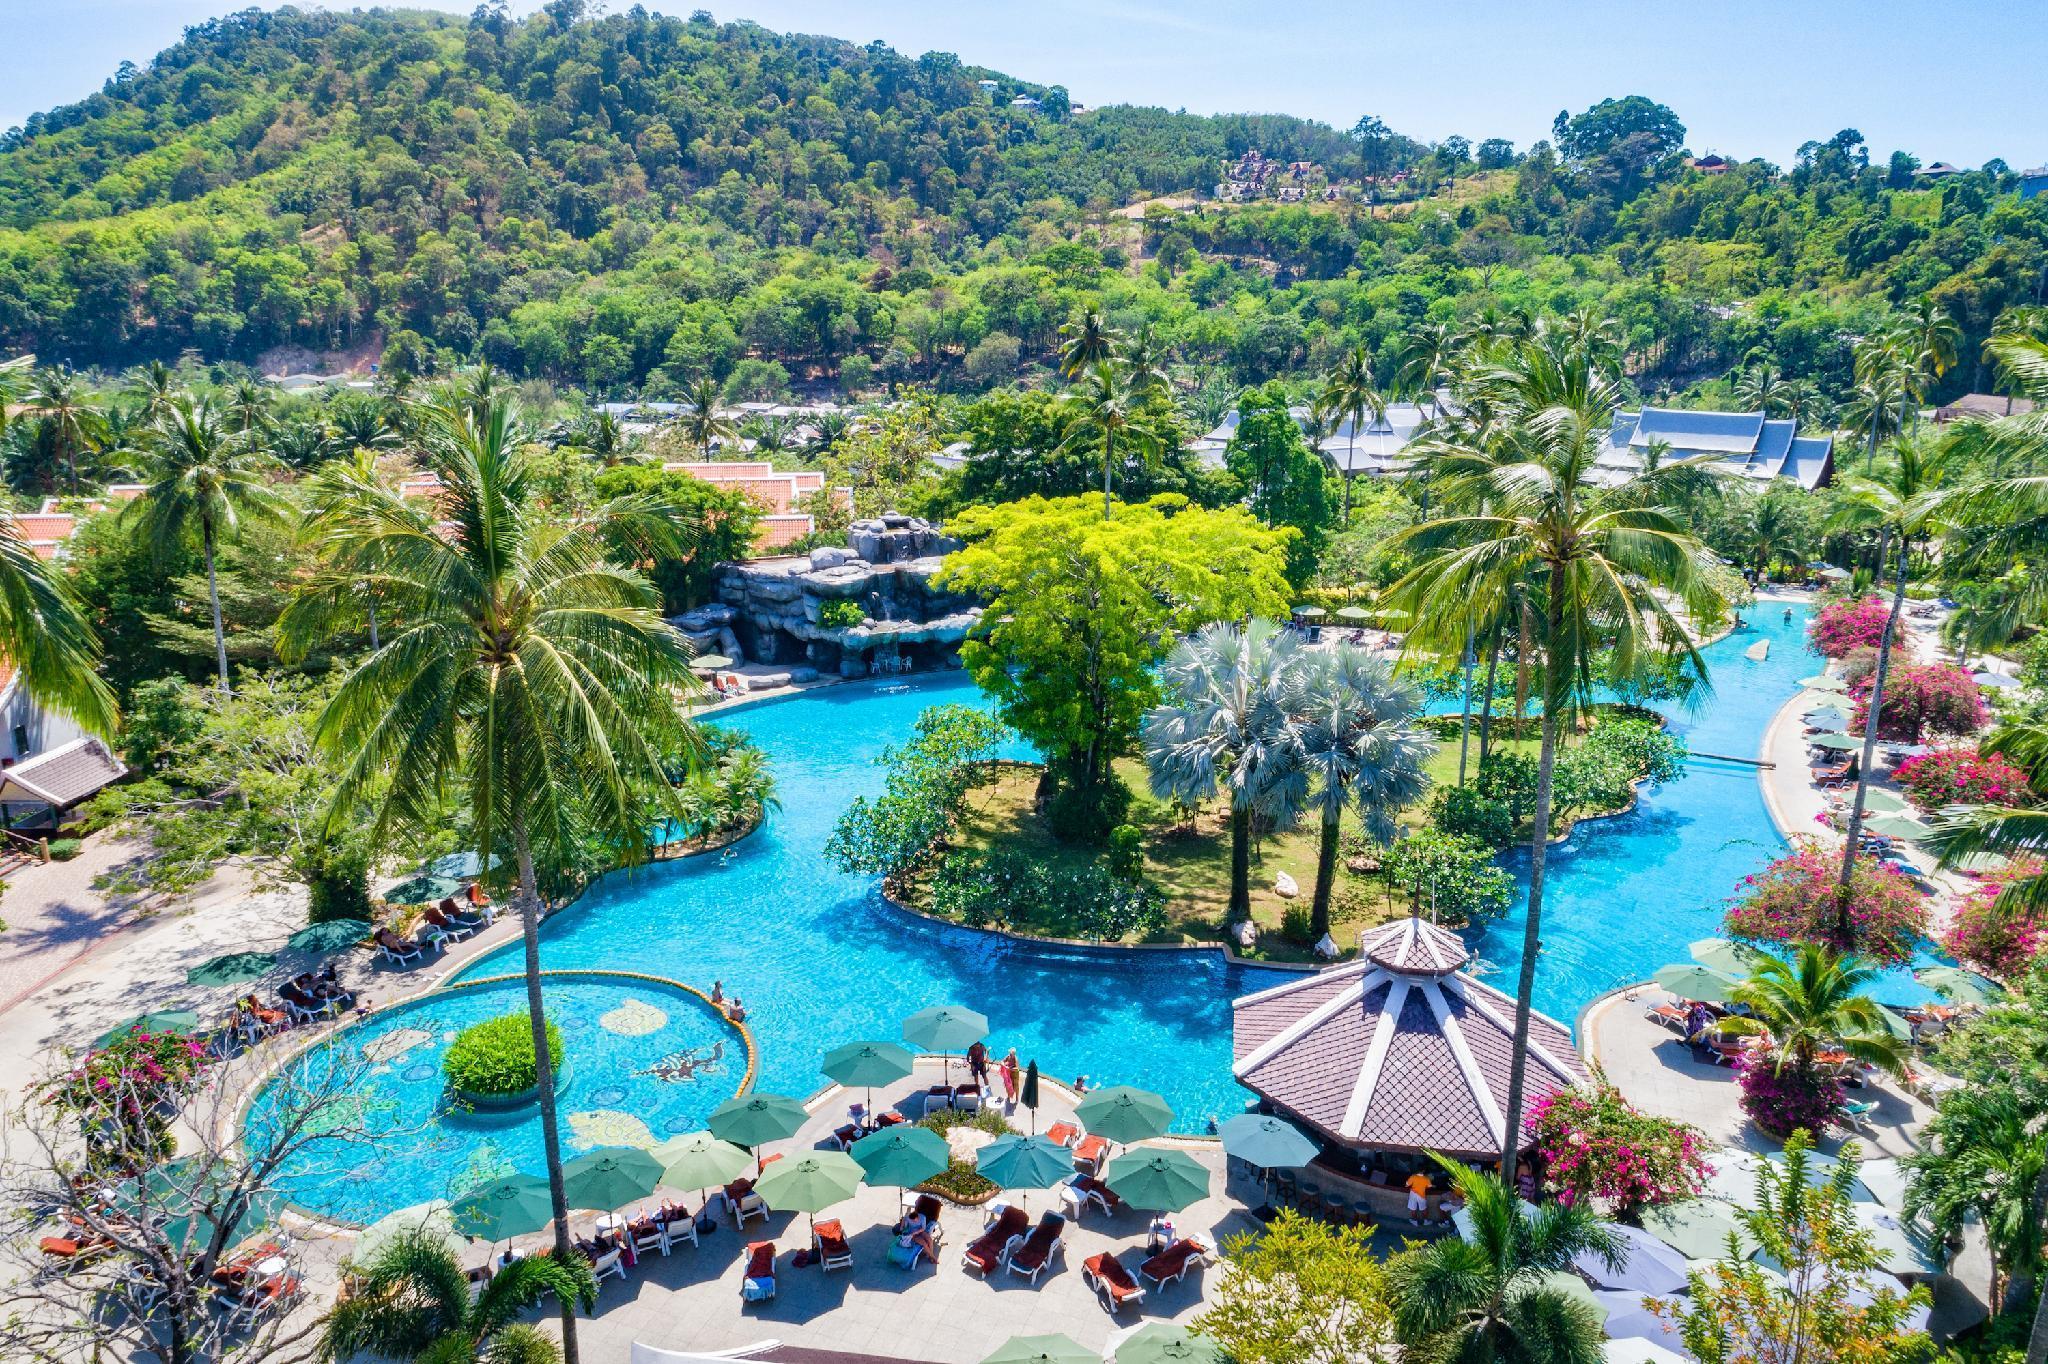 Duangjitt Resort and Spa ดวงจิต รีสอร์ต แอนด์ สปา